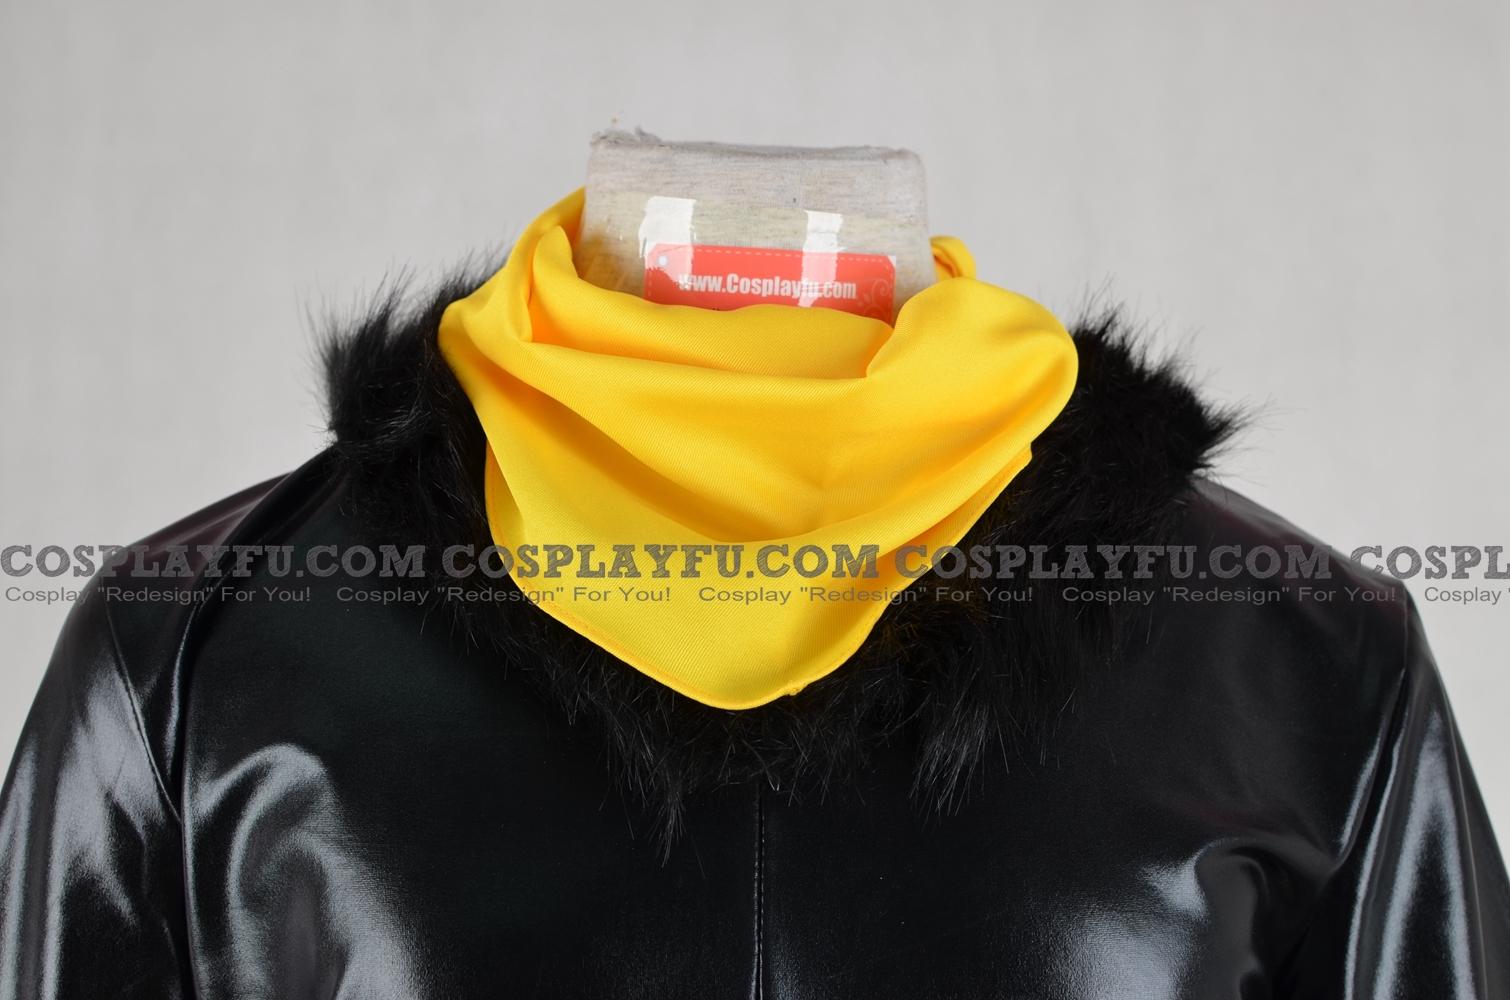 Custom Morgana Cosplay Costume from Persona 5 - CosplayFU.com